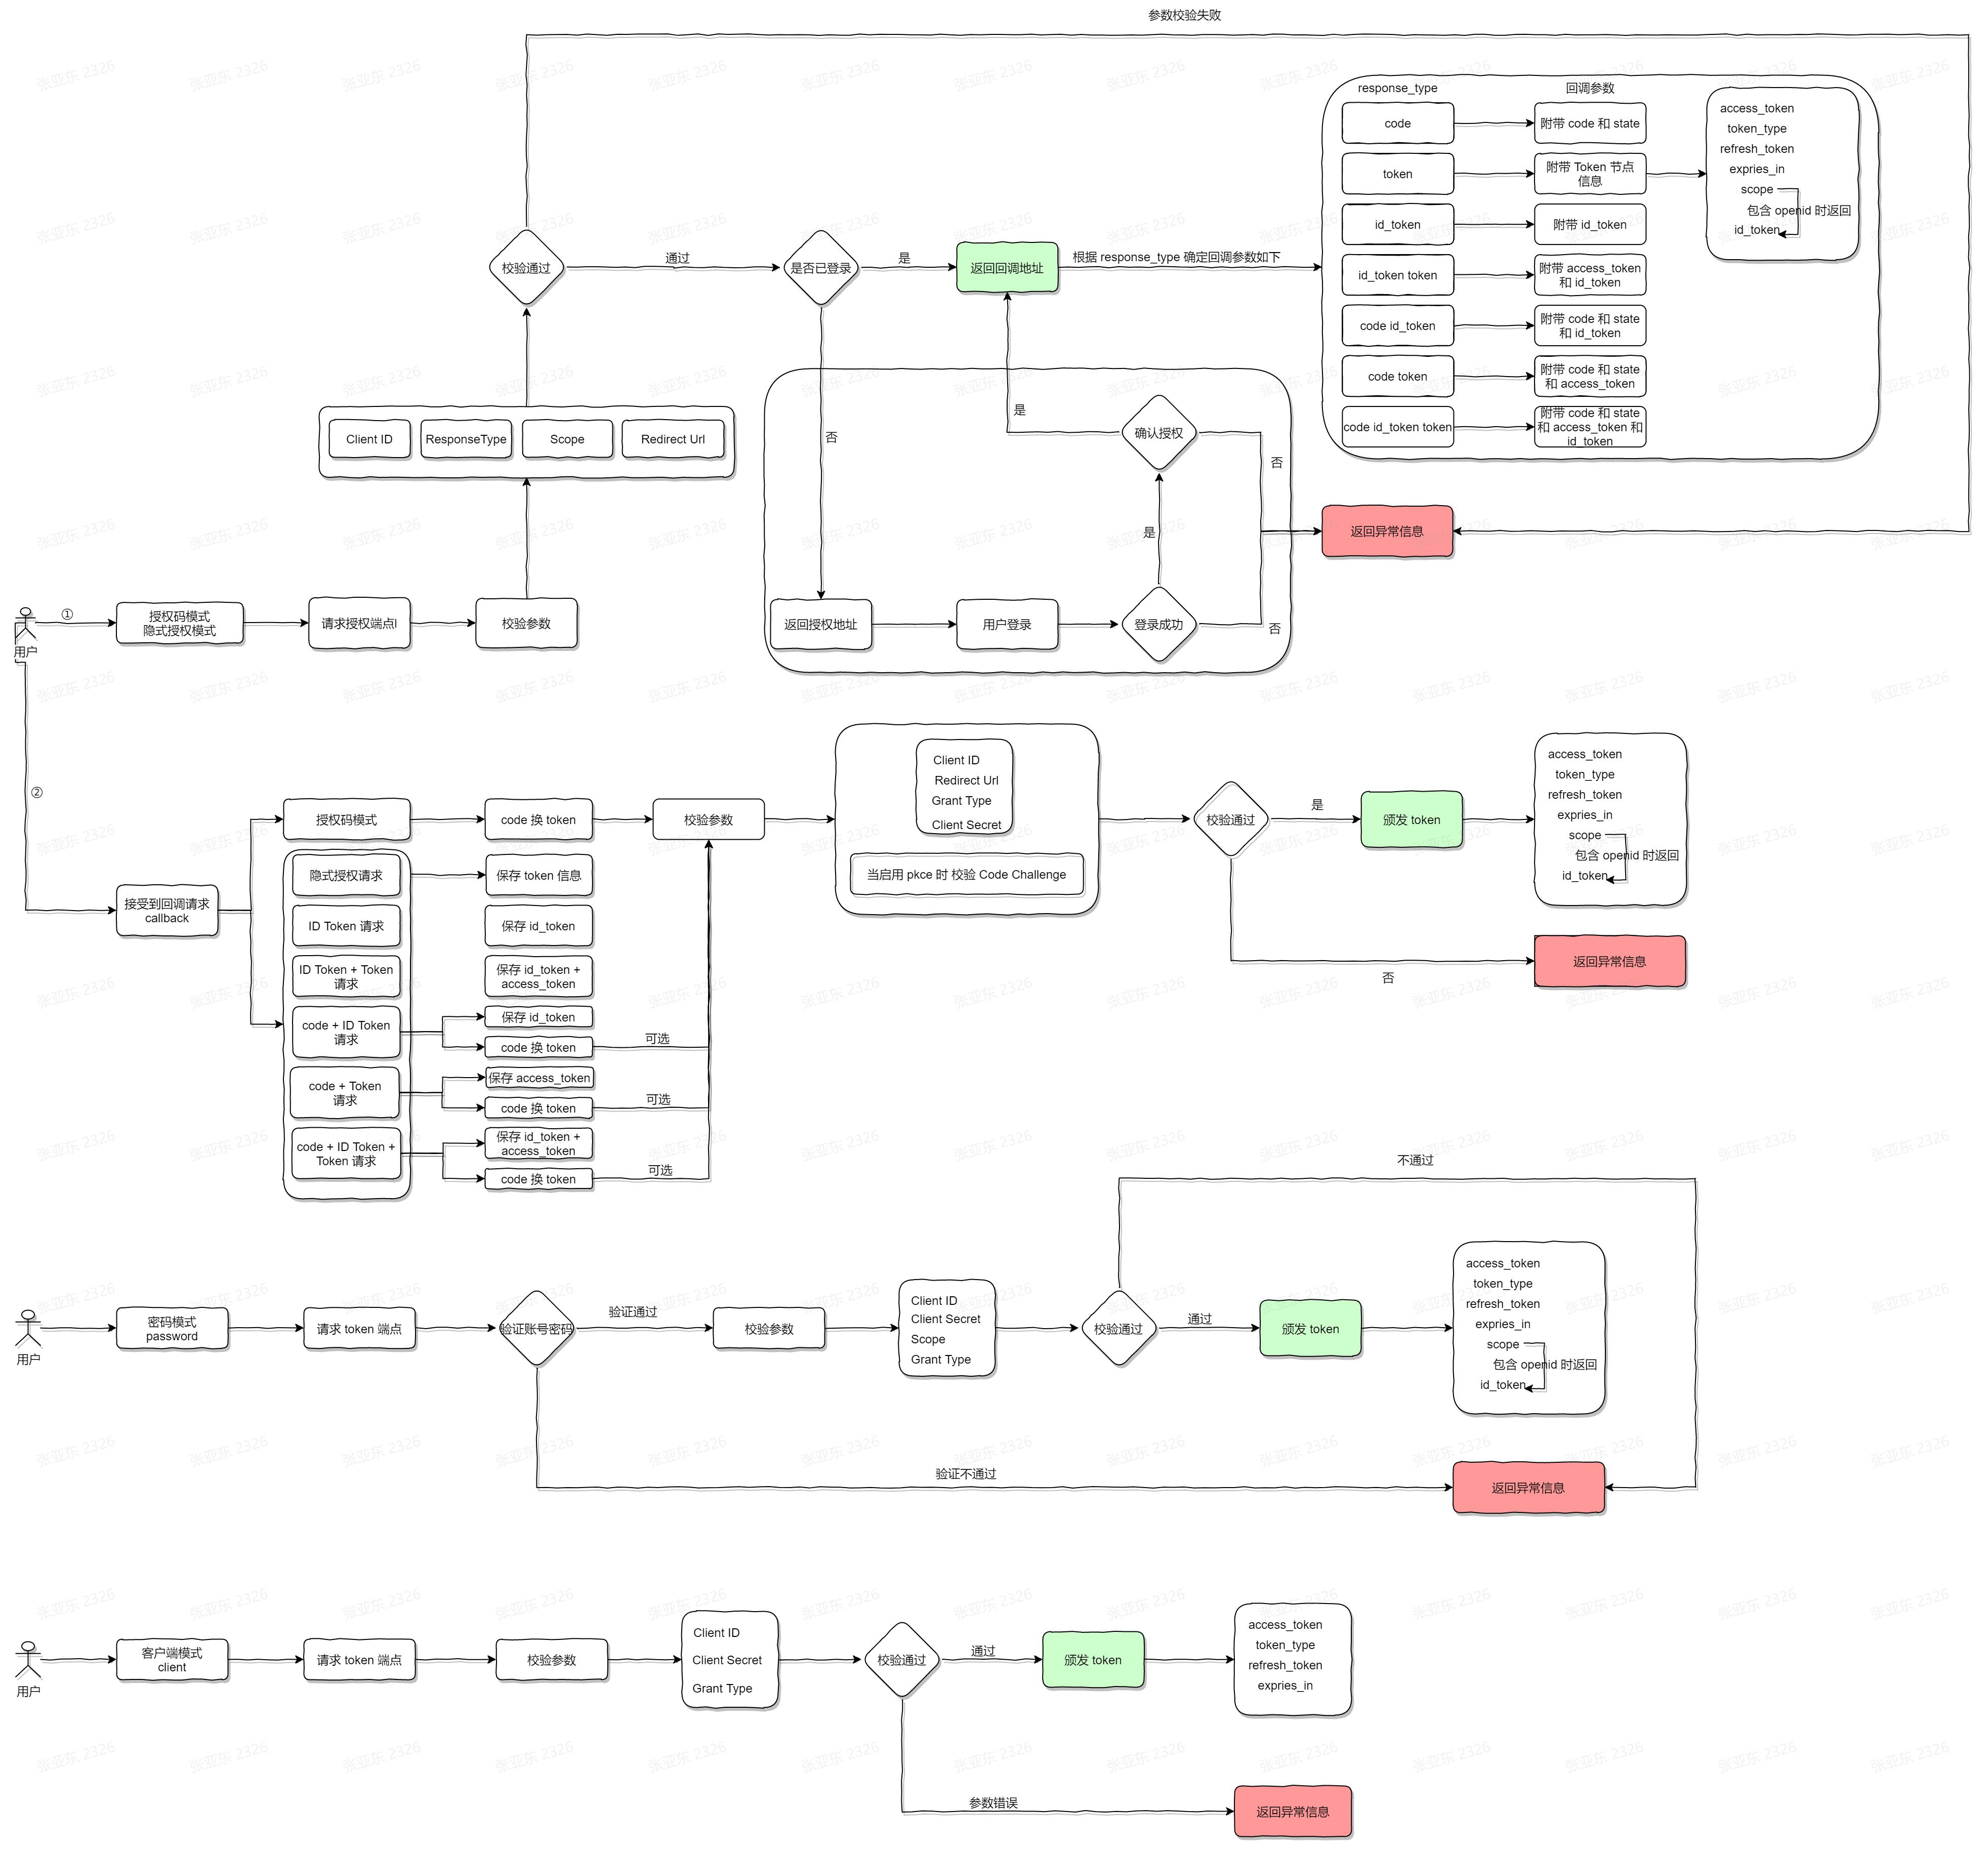 jap-ids 流程图.jpg